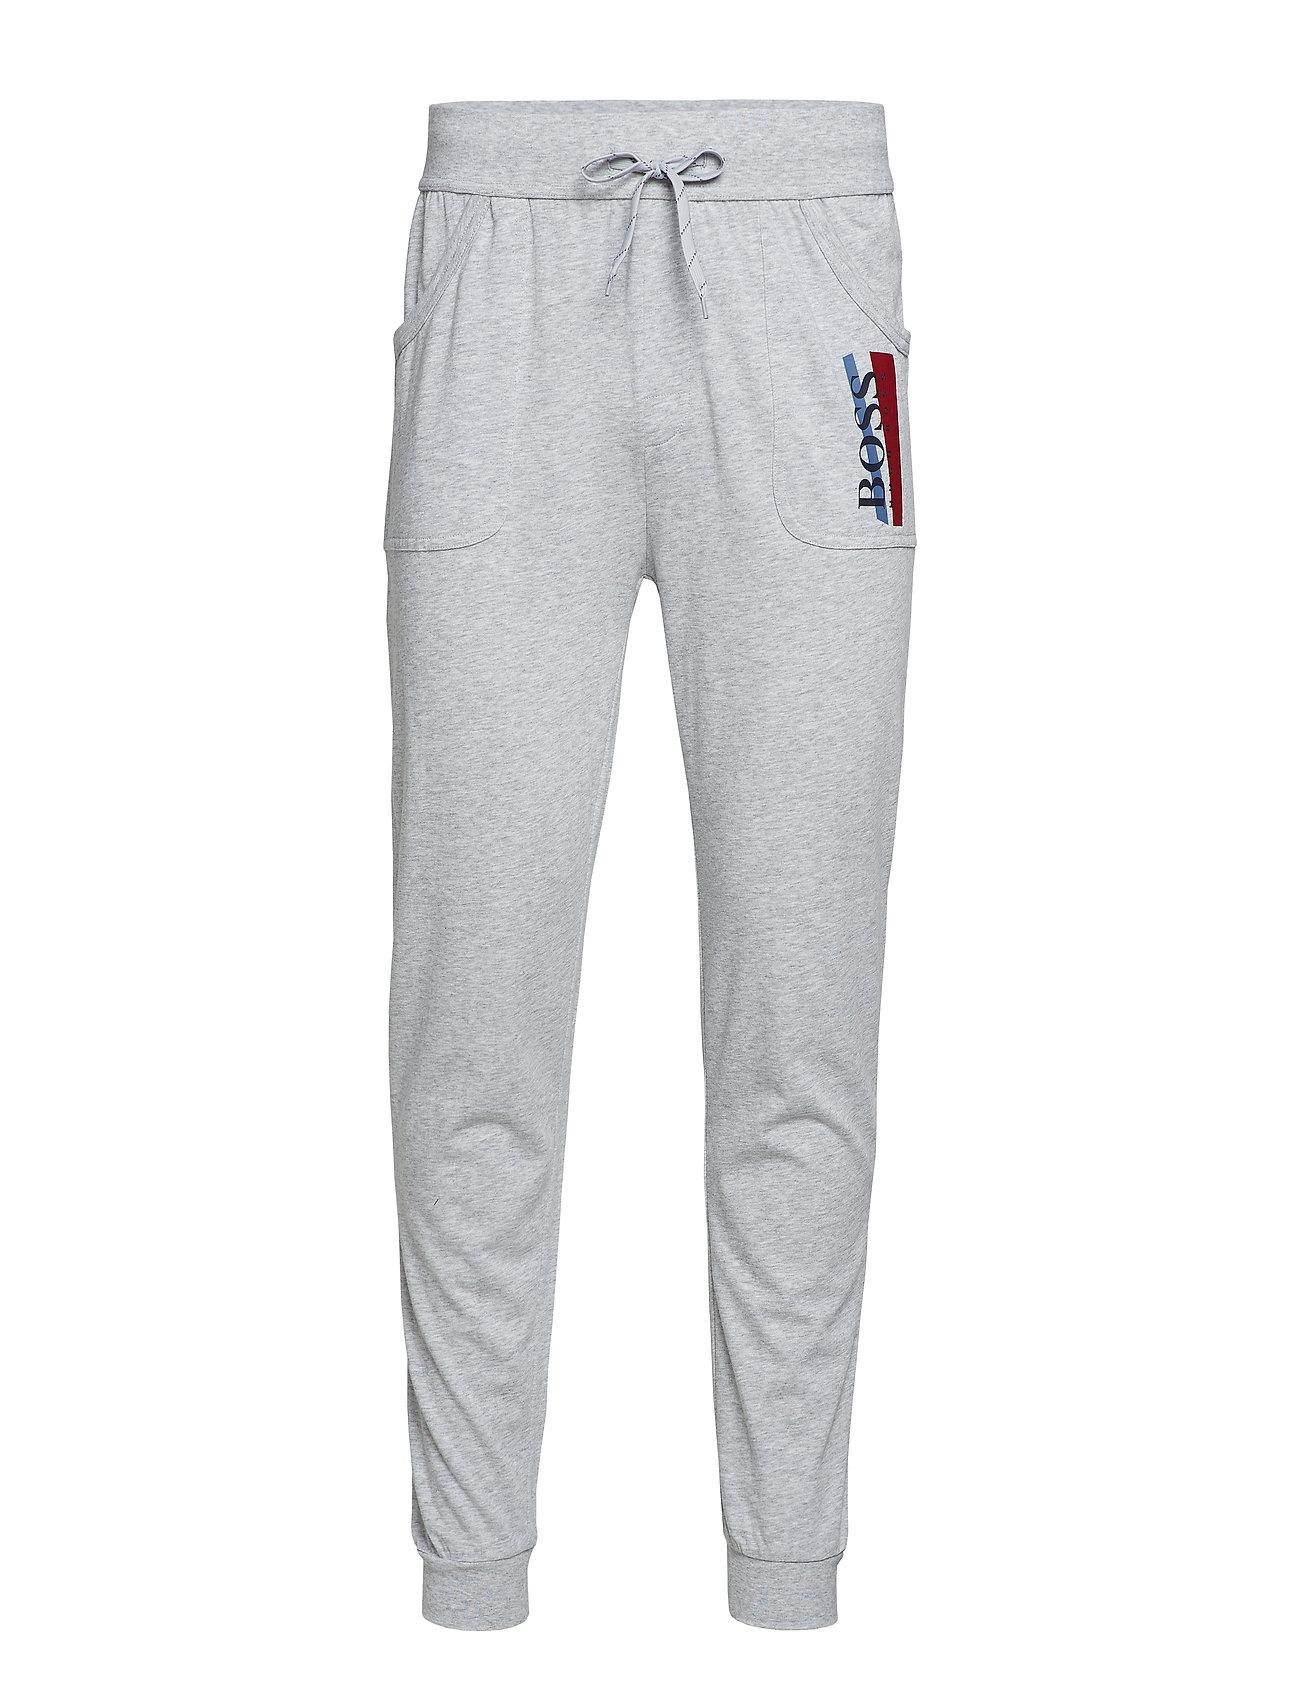 BOSS Business Wear Authentic Pants - MEDIUM GREY